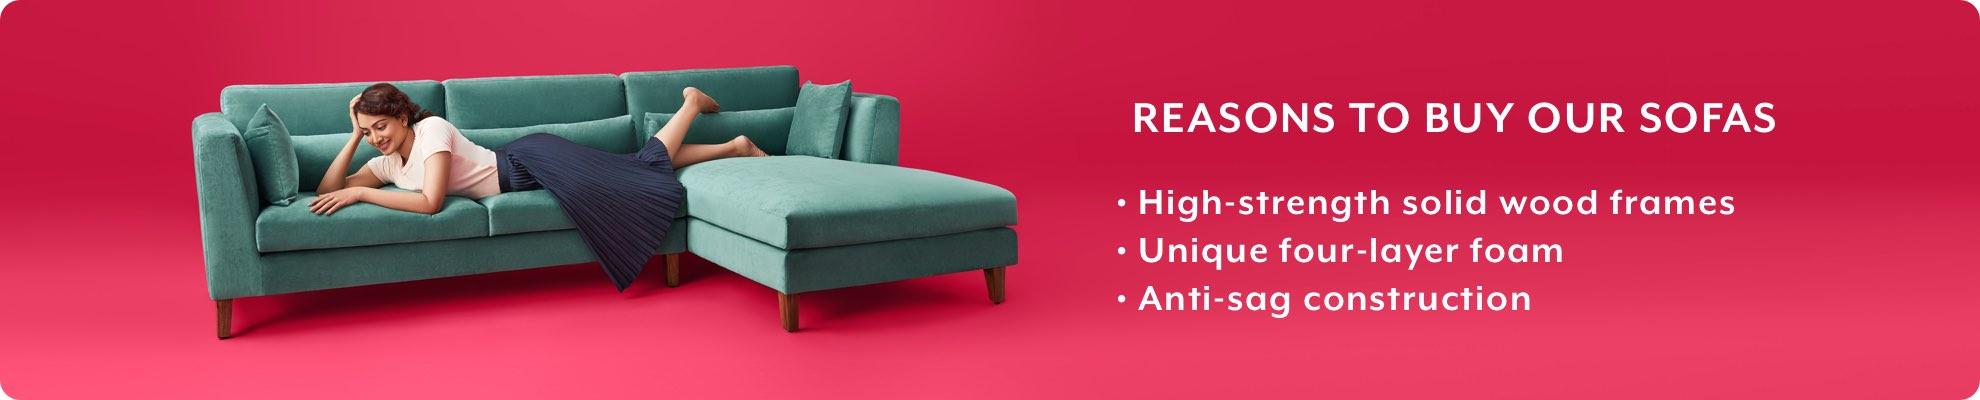 Sofa Campaign LP